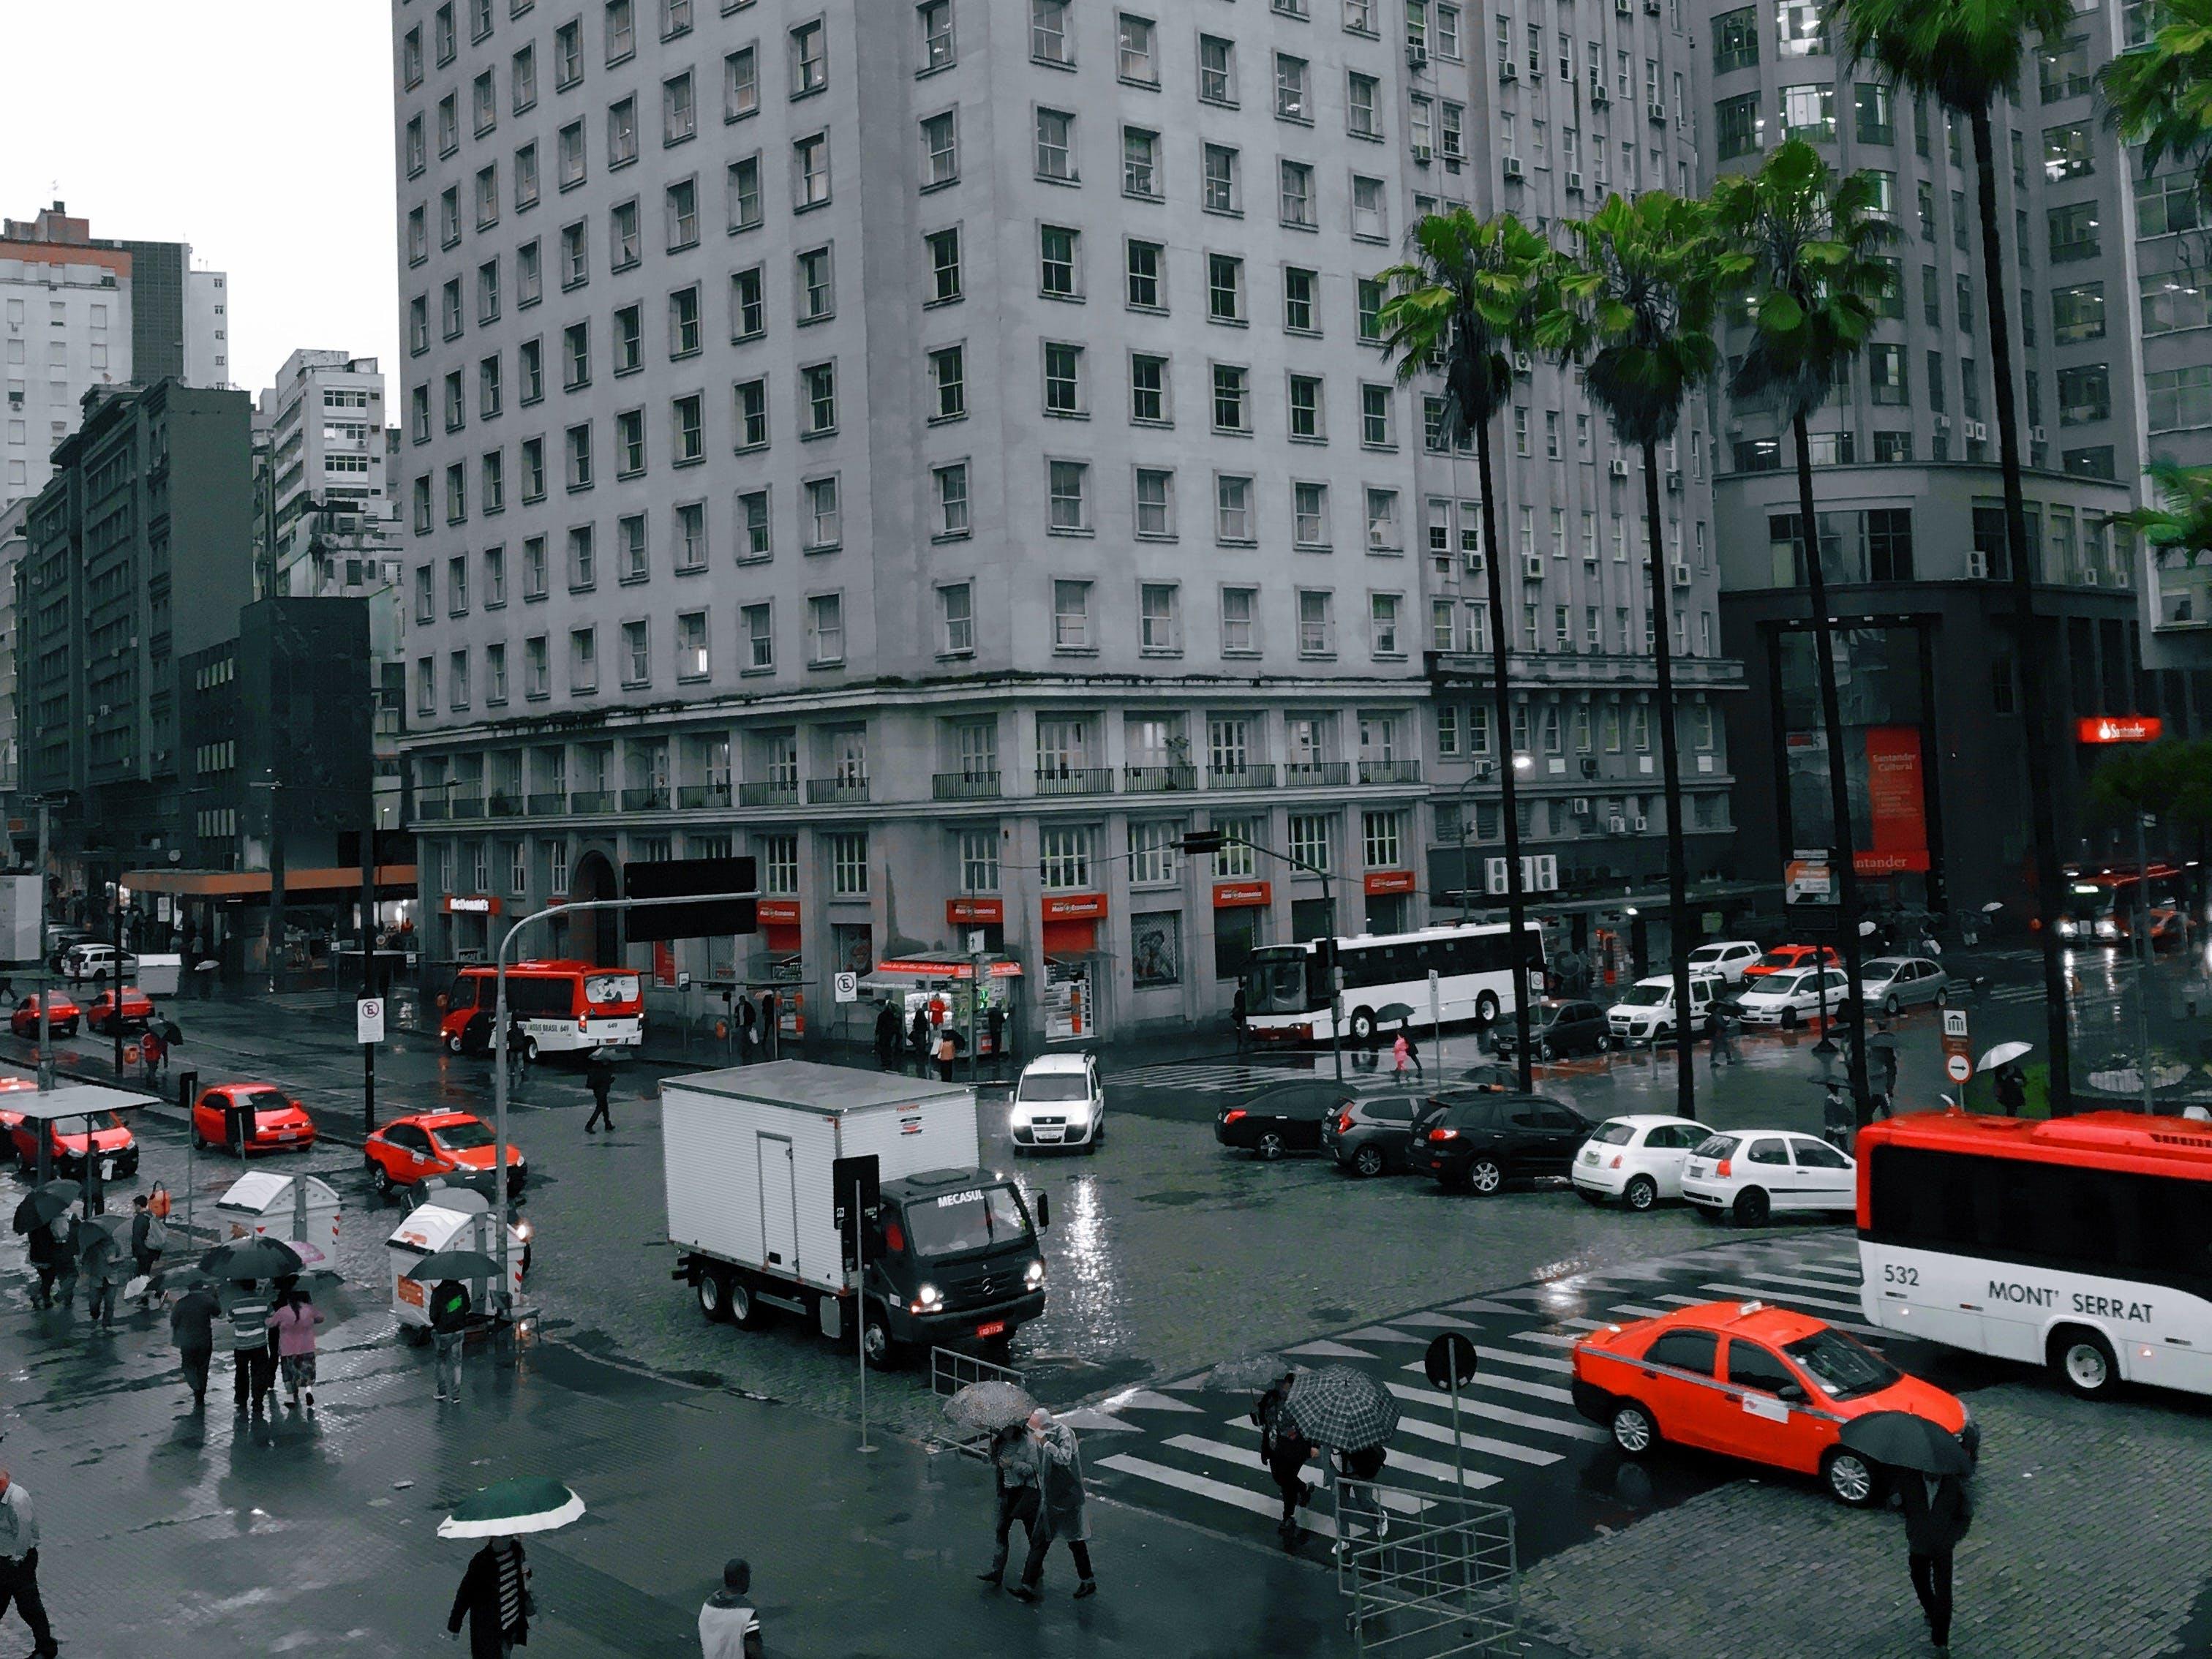 Free stock photo of building, car, orange, people